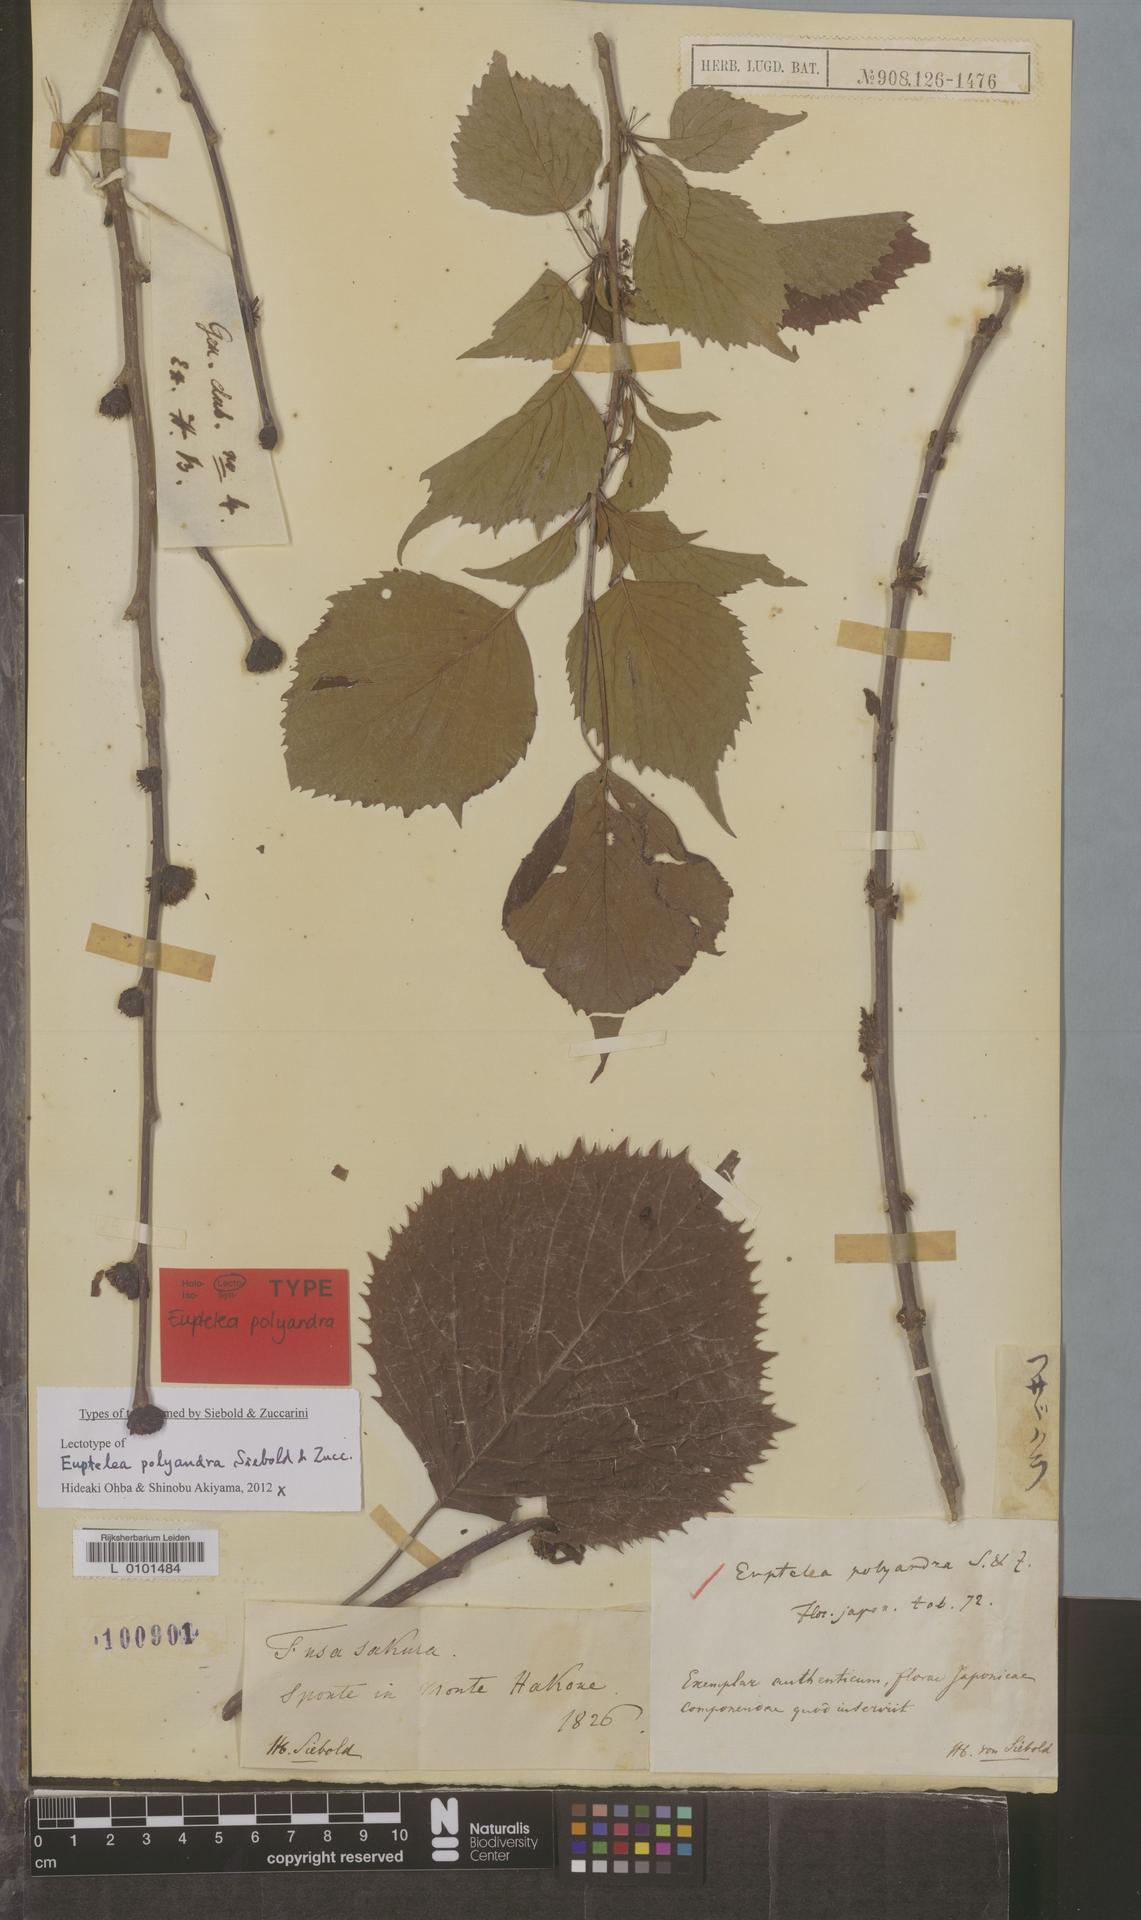 L  0101484 | Euptelea polyandra Siebold & Zucc.